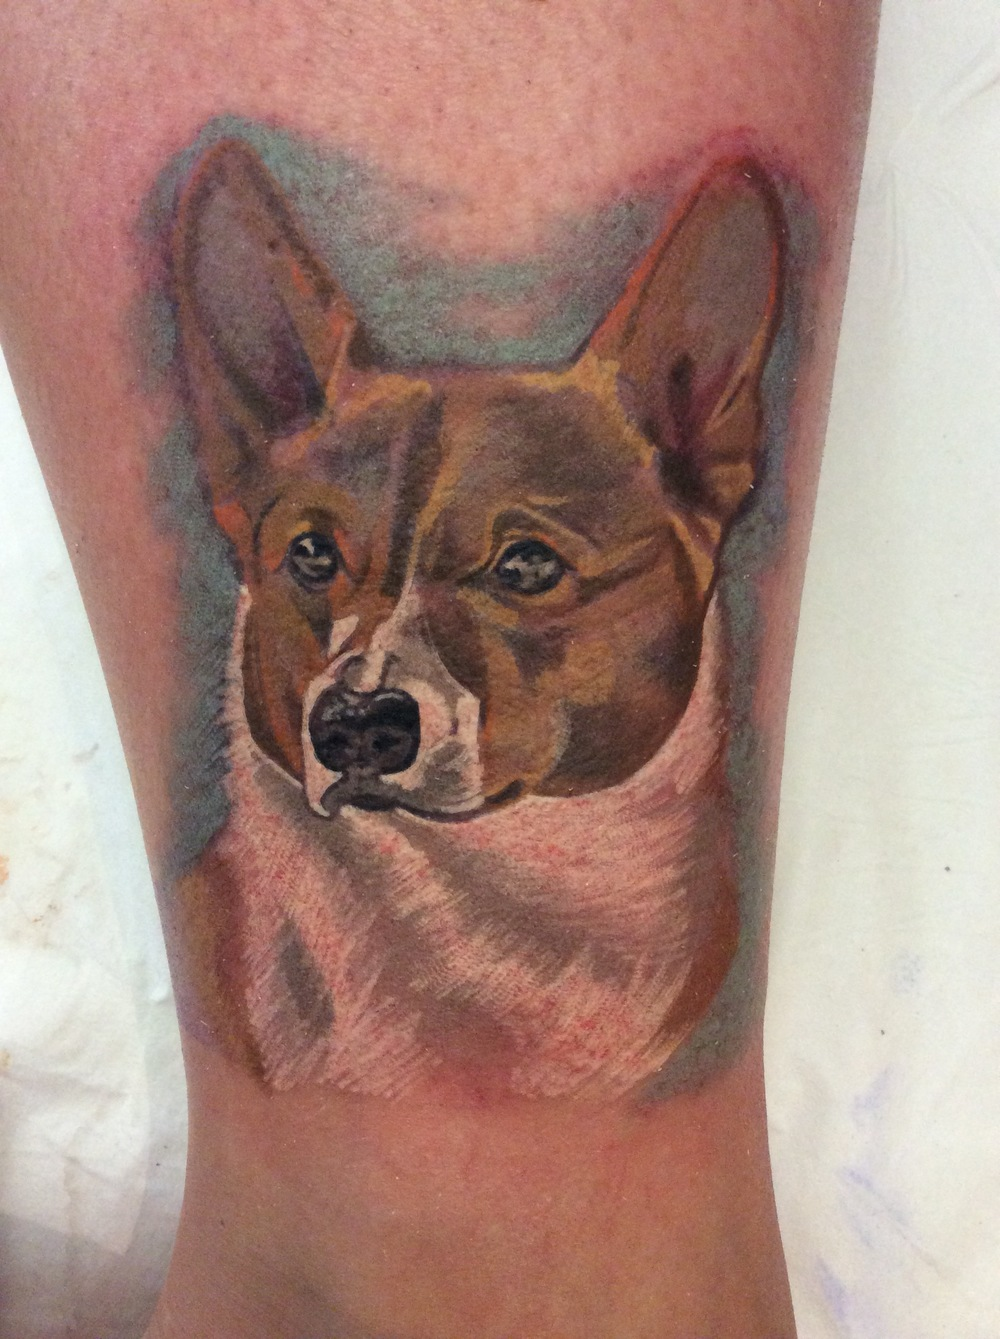 Corgie_dog_tattoo.jpg